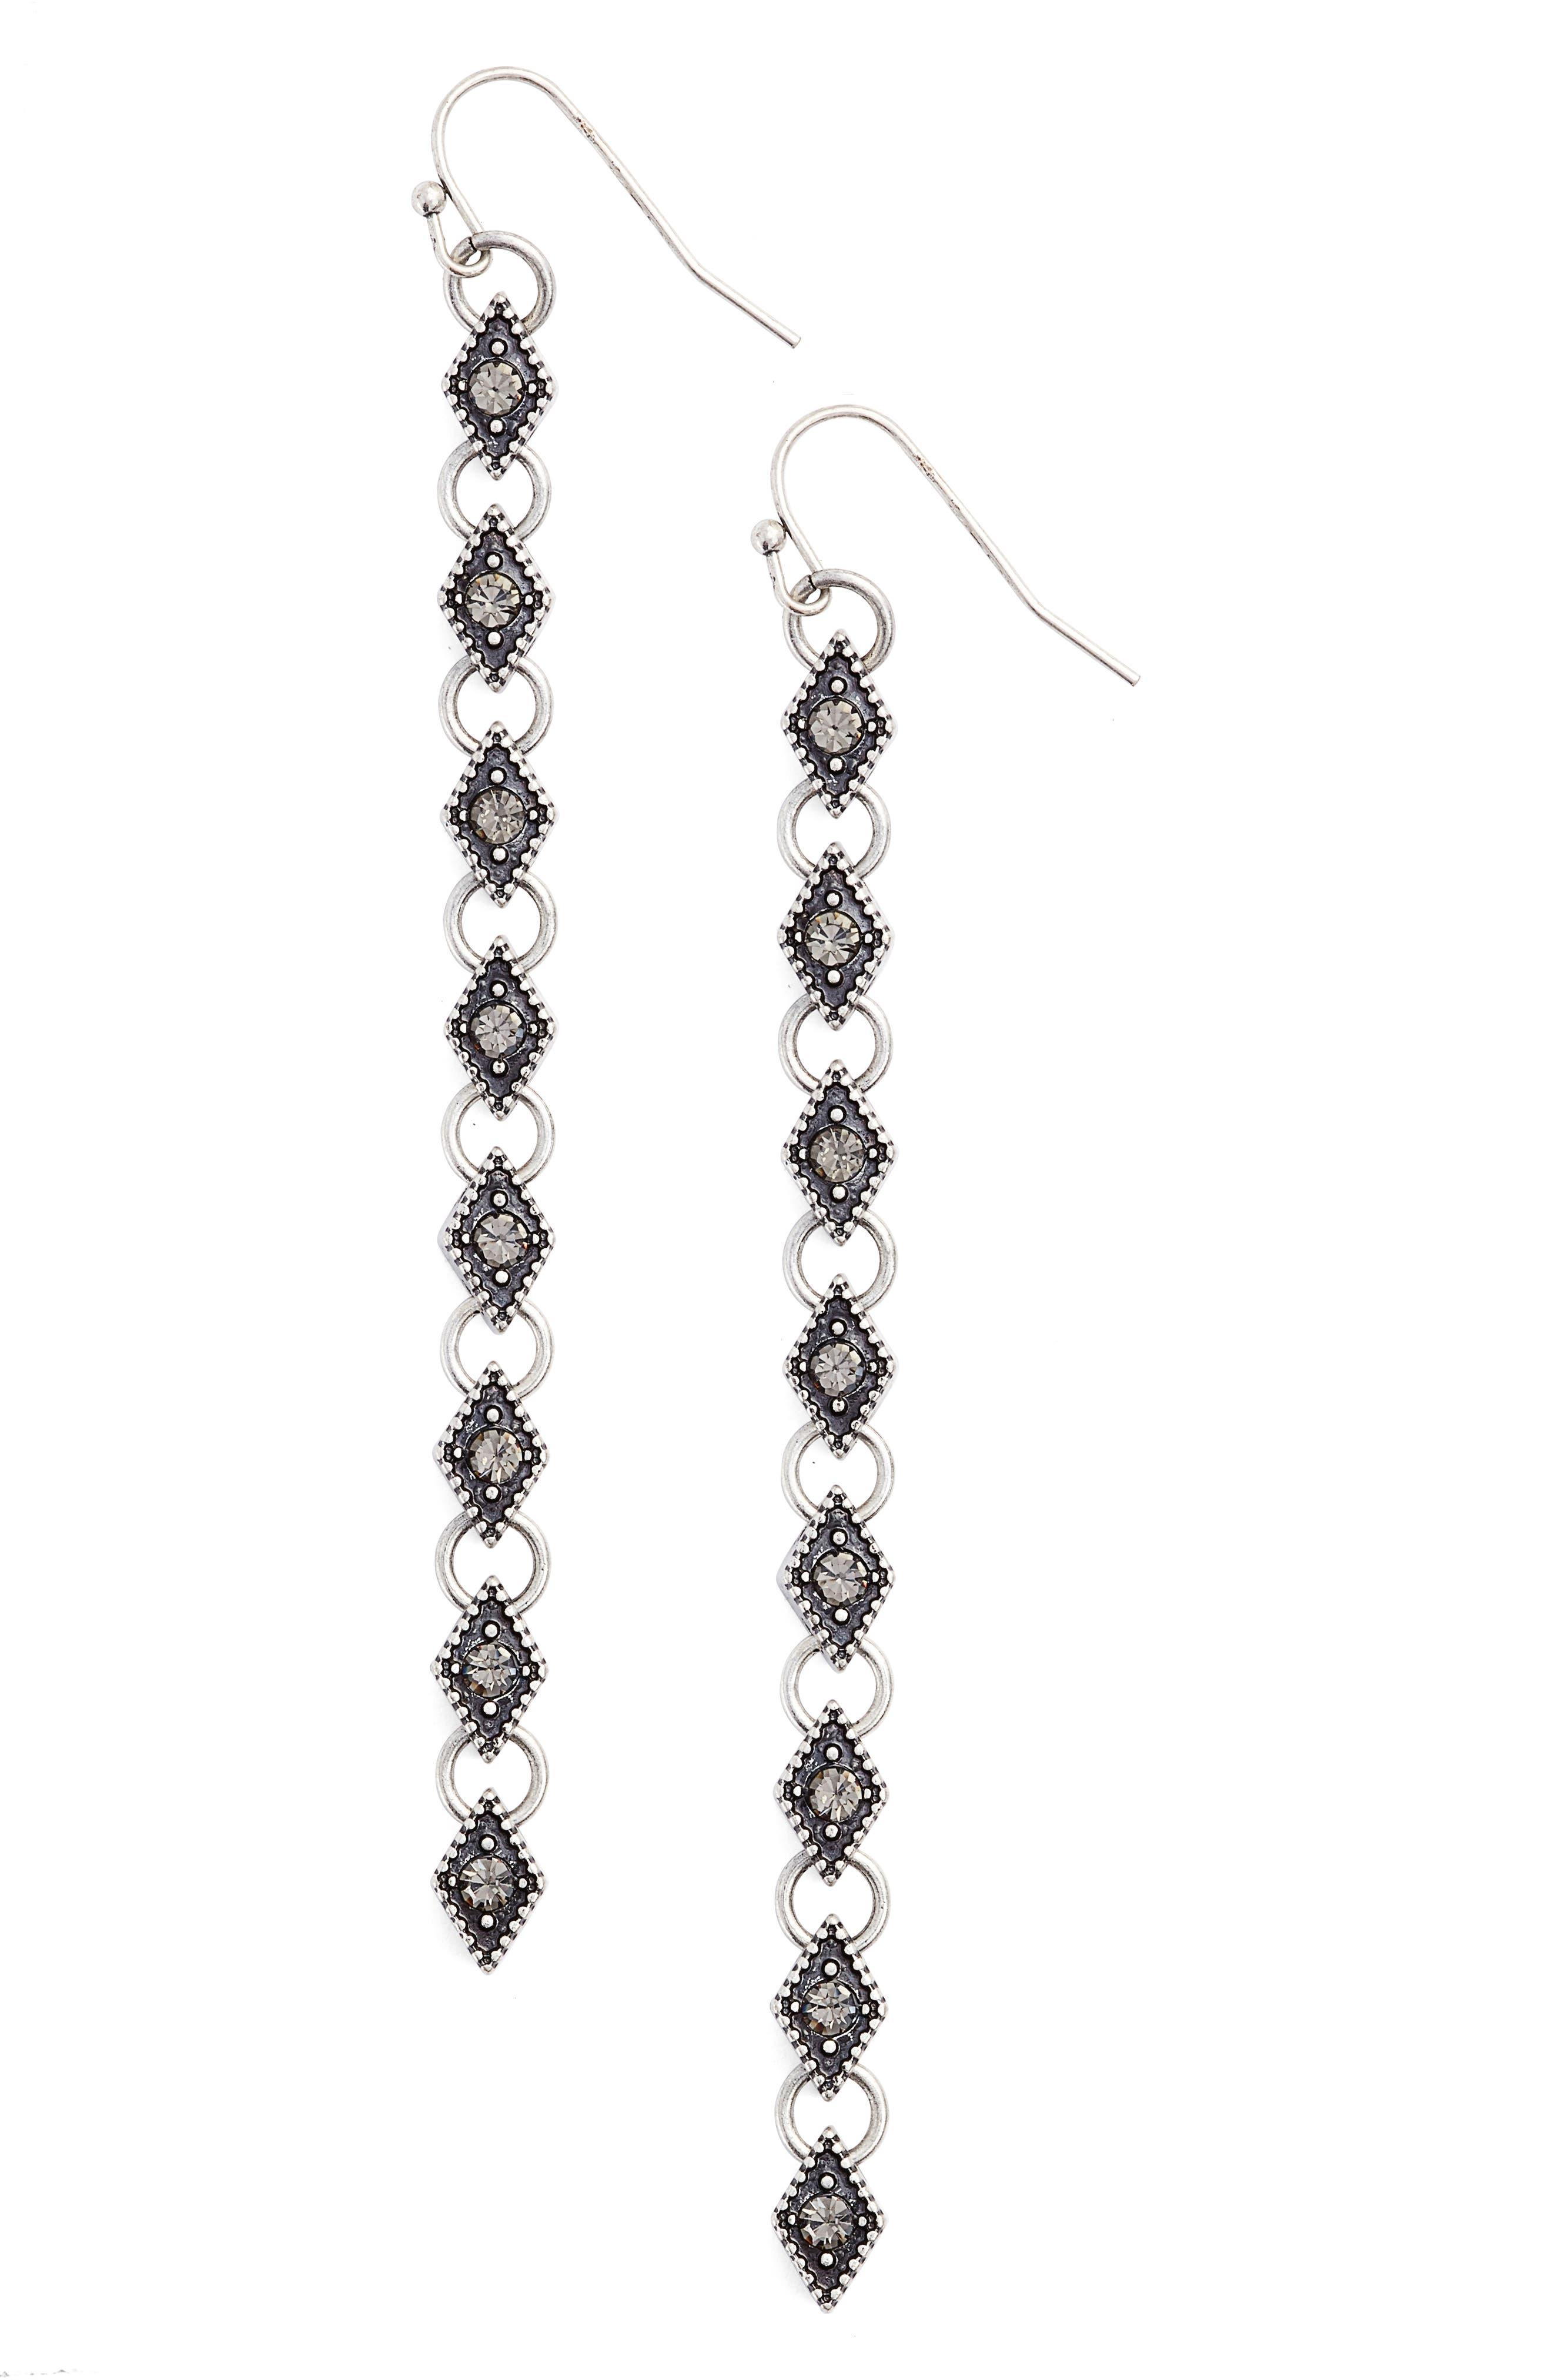 Link Drop Earrings,                             Main thumbnail 1, color,                             040